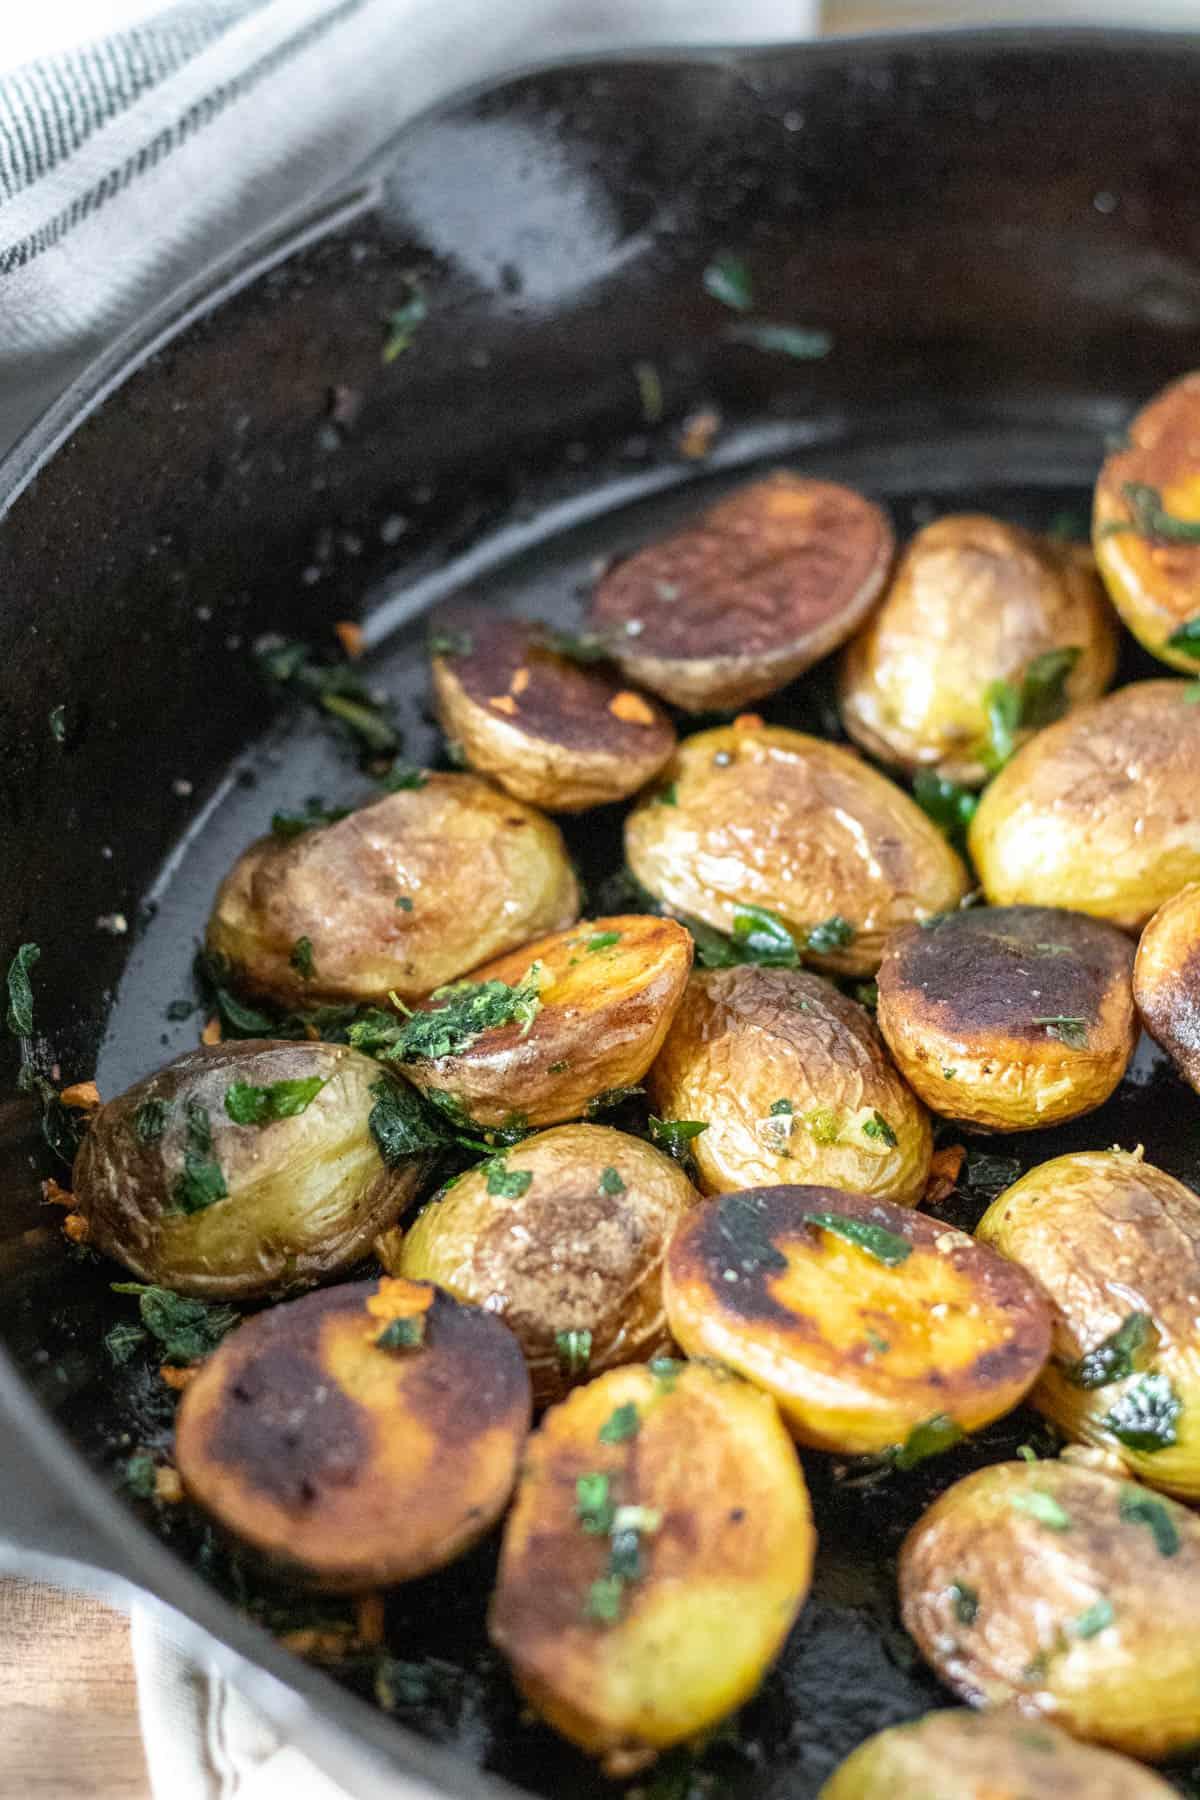 Crispy skillet potatoes in cast iron pan.